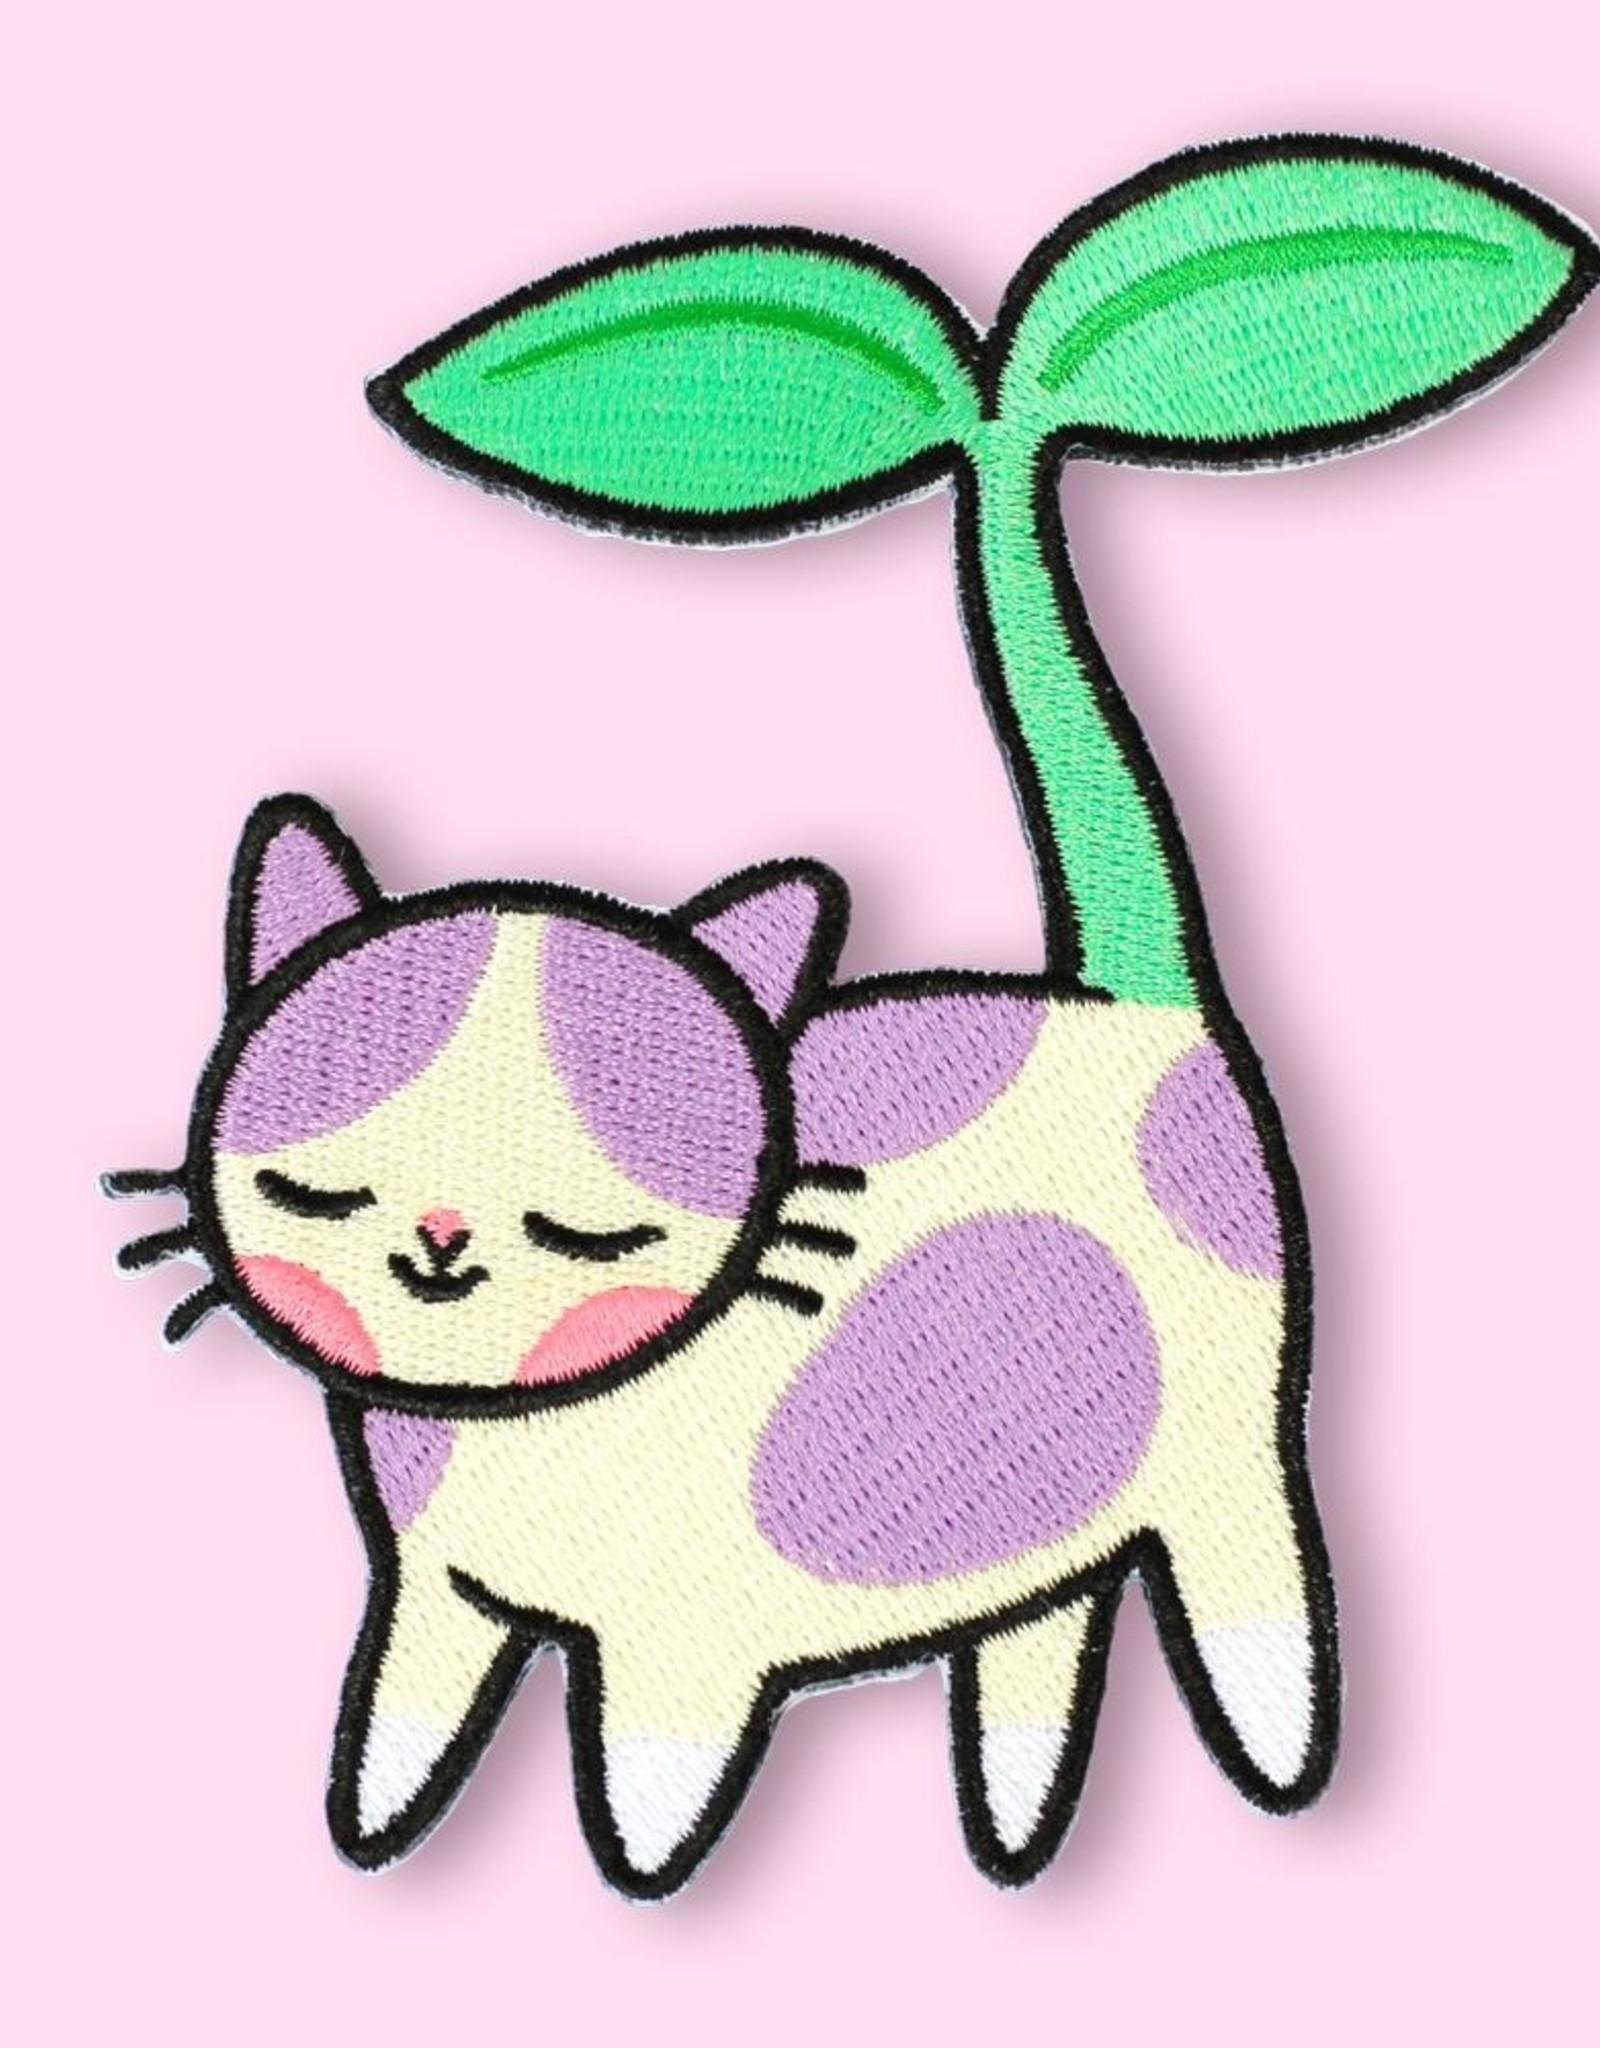 Pony People Pony People - Plant kitty patch